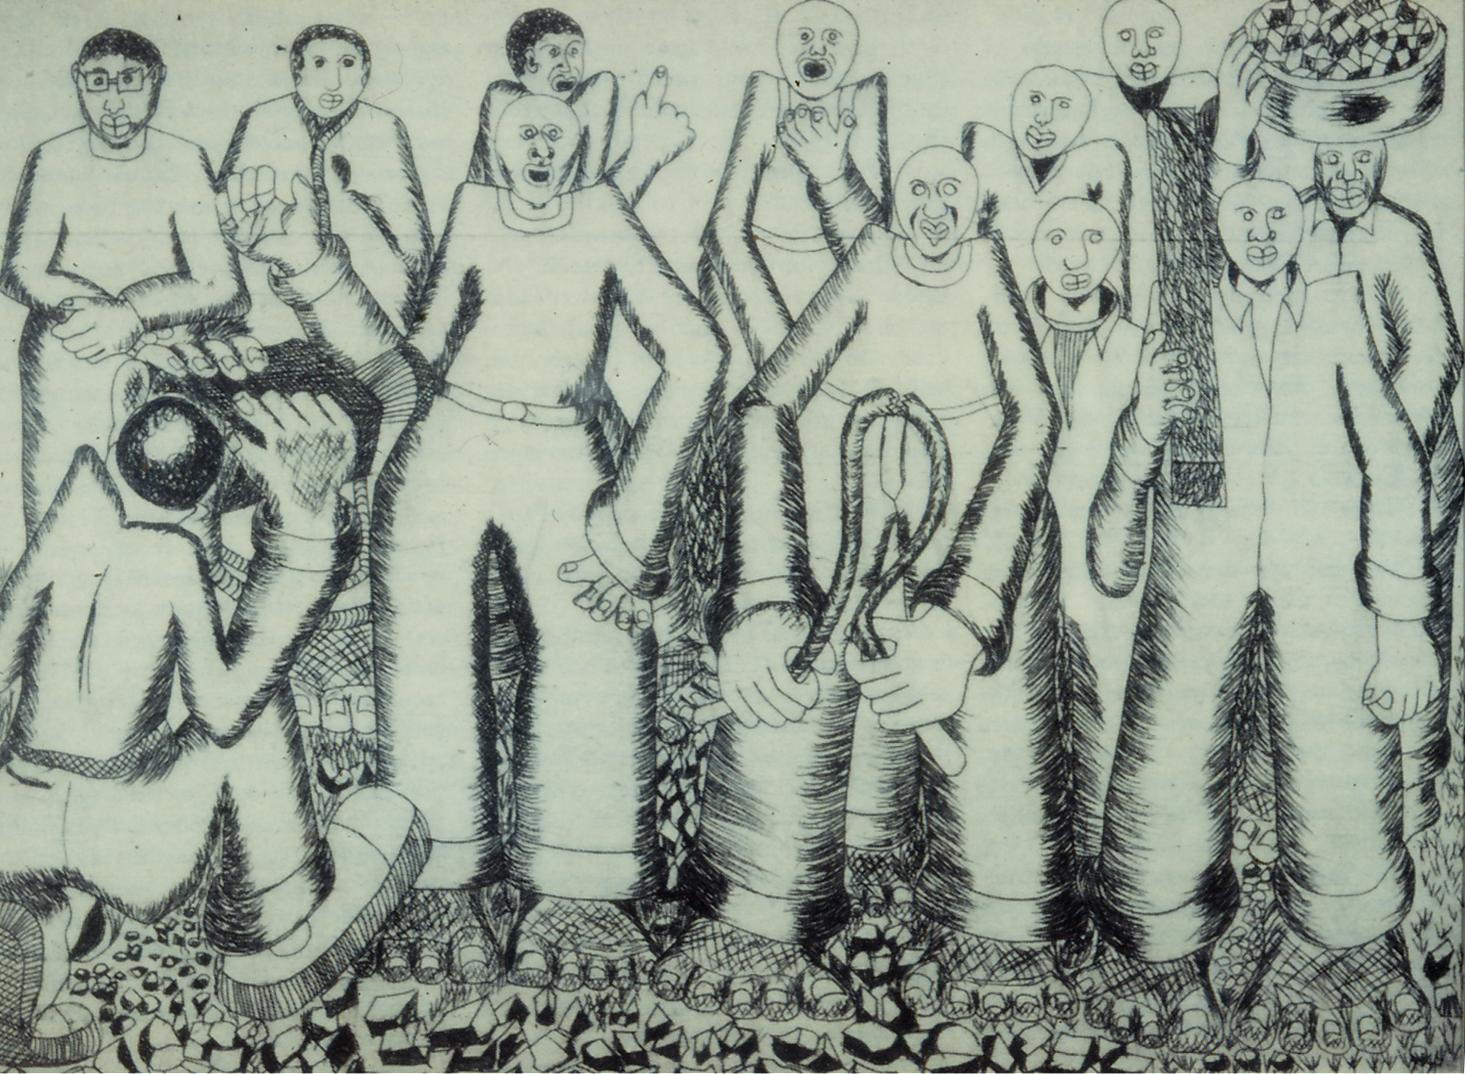 Patrick Holo, Microcosm, 1982.